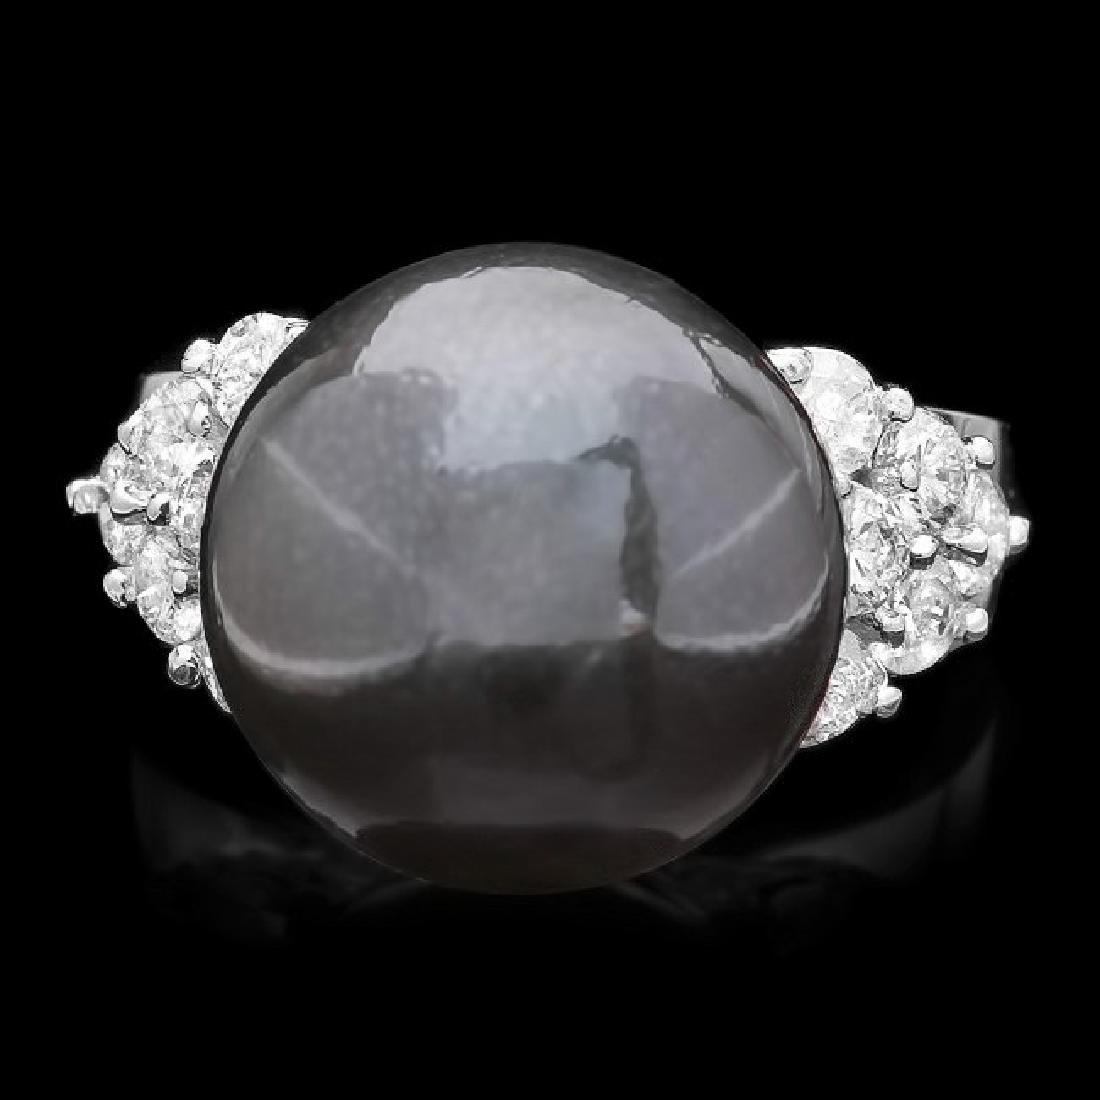 14k Gold 13 X 13mm Pearl 0.85ct Diamond Ring